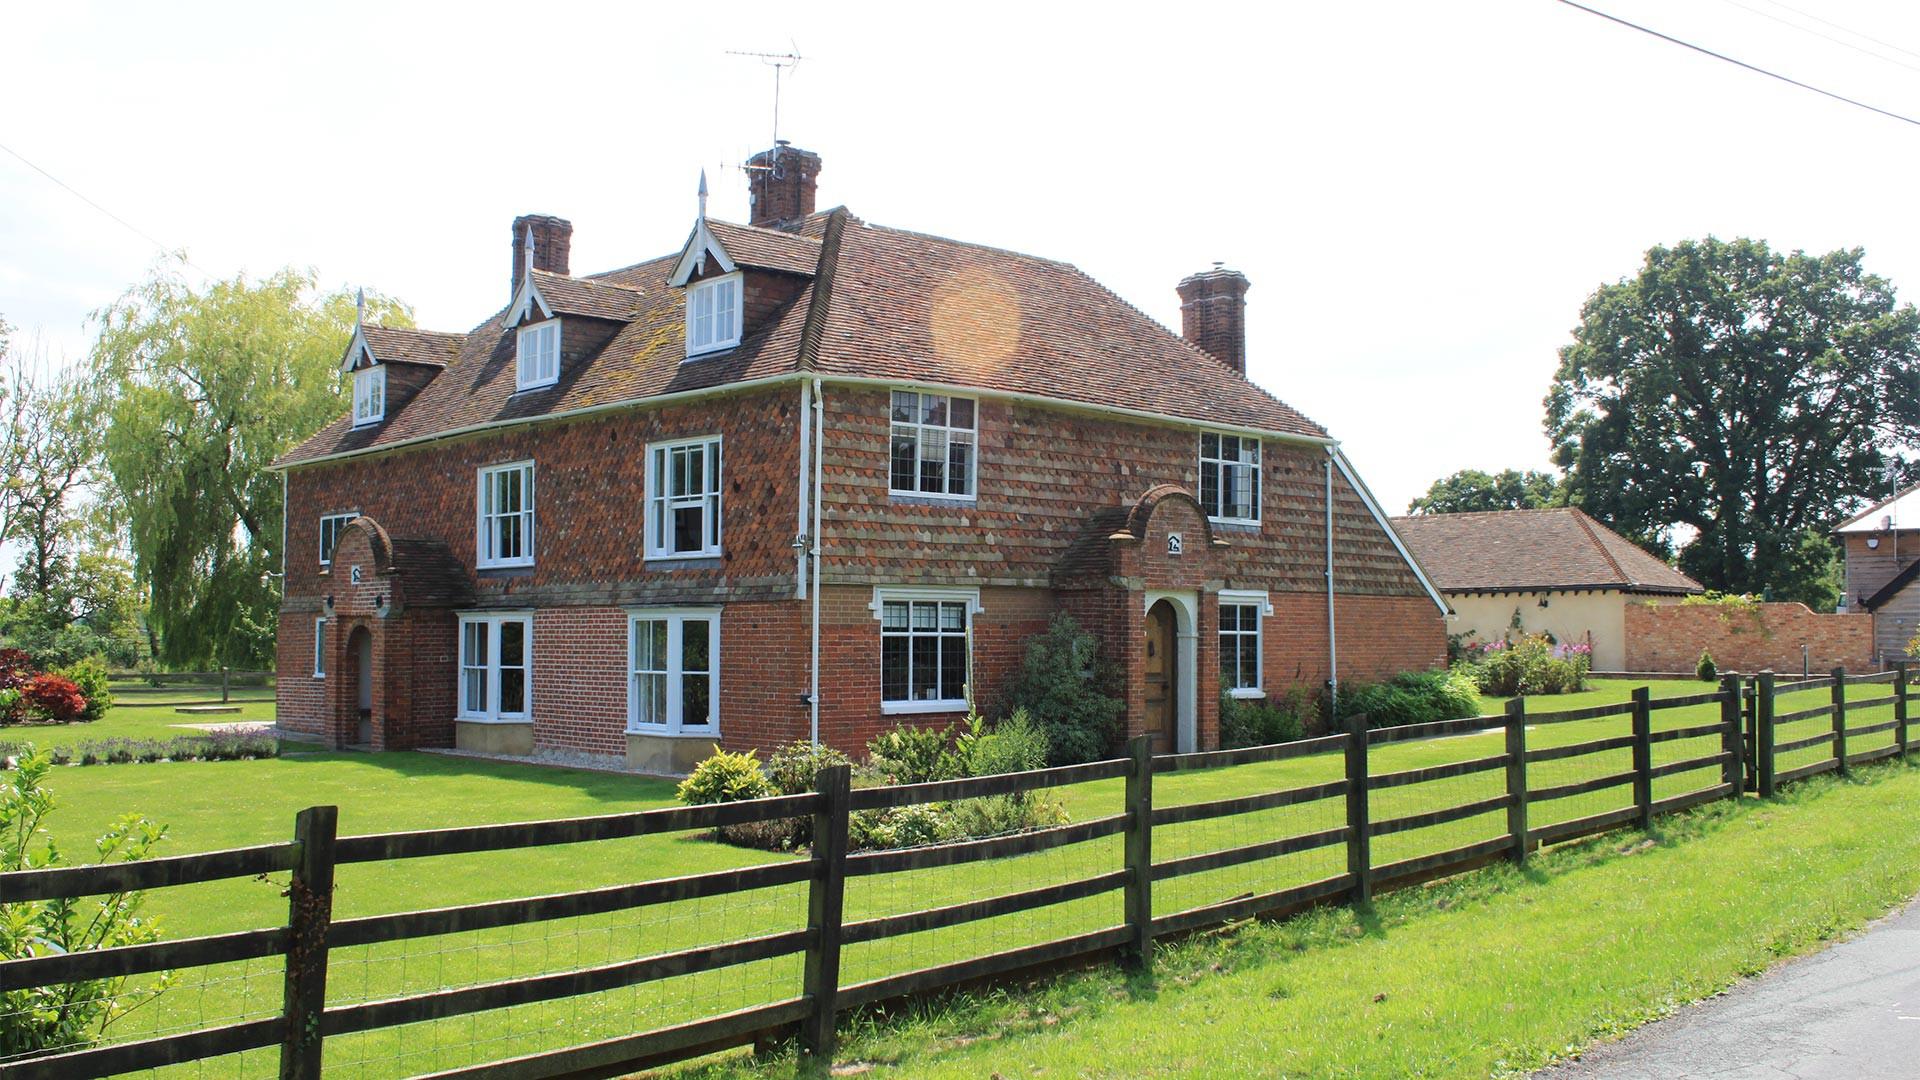 Green Farm's retreats revolve around a country house